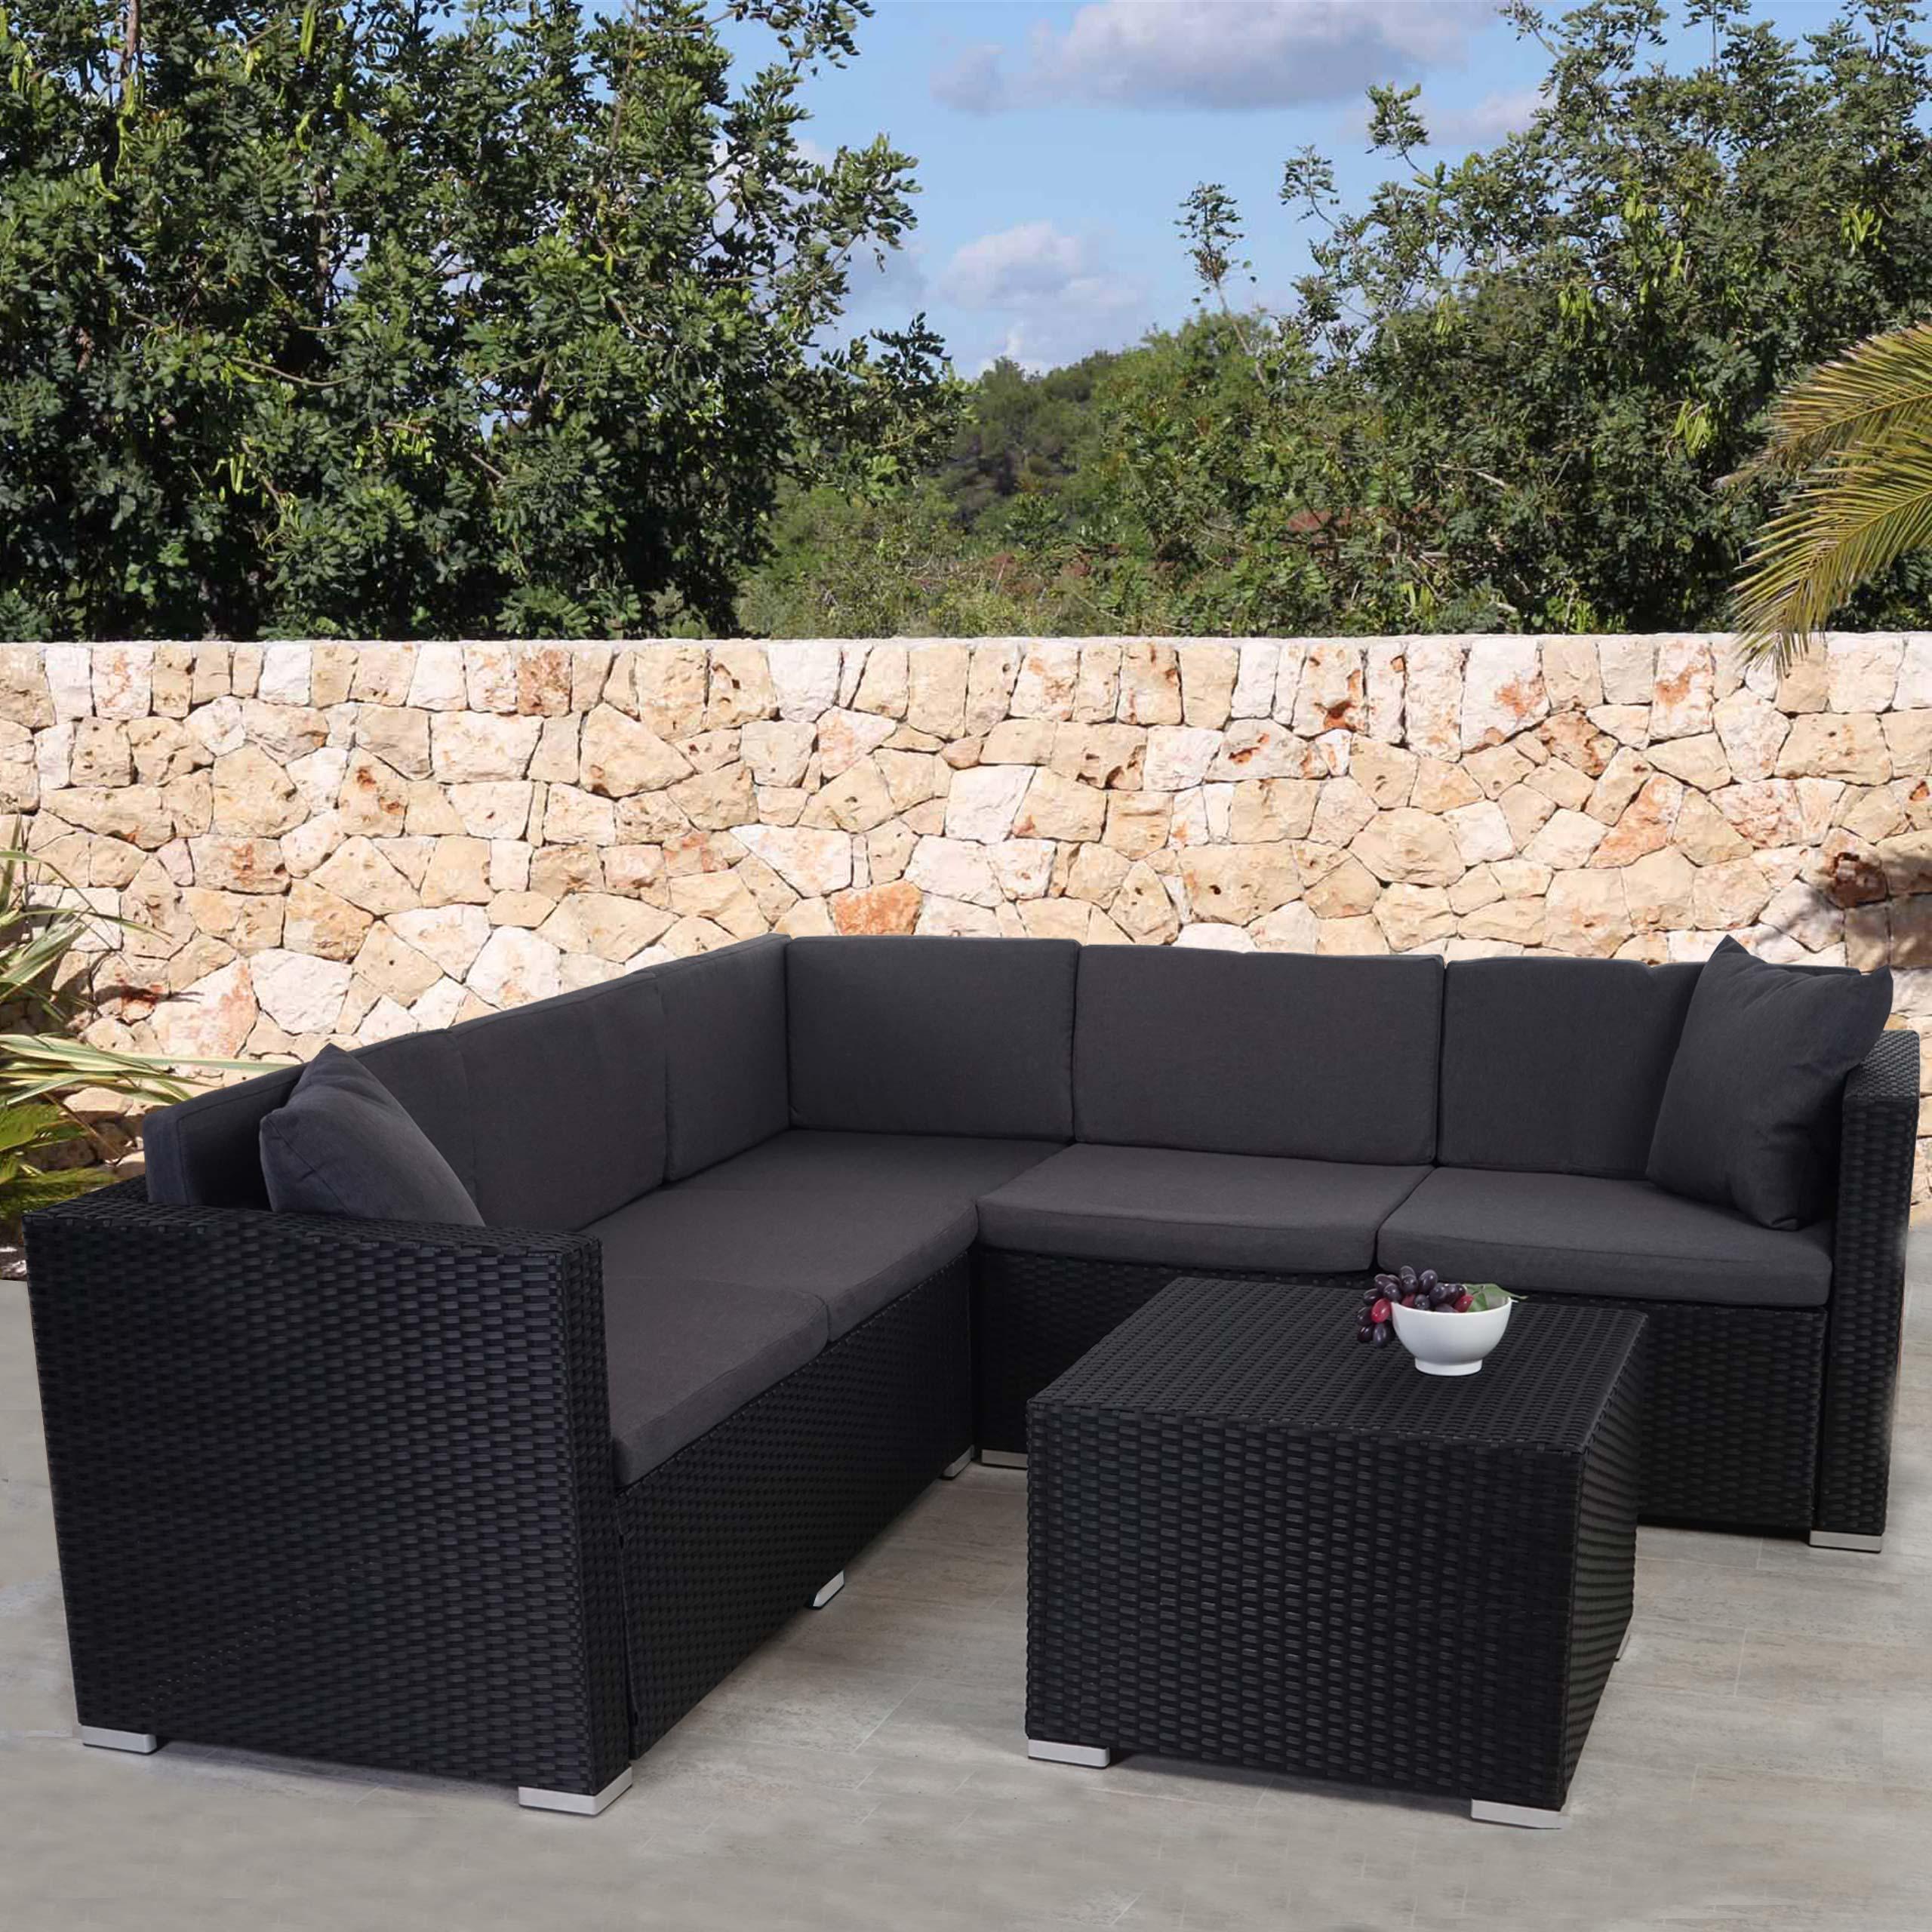 Full Size of Polyrattan Sofa 2 Sitzer Couch Grau Gartensofa Set Ausziehbar 2 Sitzer Balkon Outdoor Lounge Rattan Tchibo Garden L Mit Schlaffunktion Bora Chippendale Sofa Polyrattan Sofa